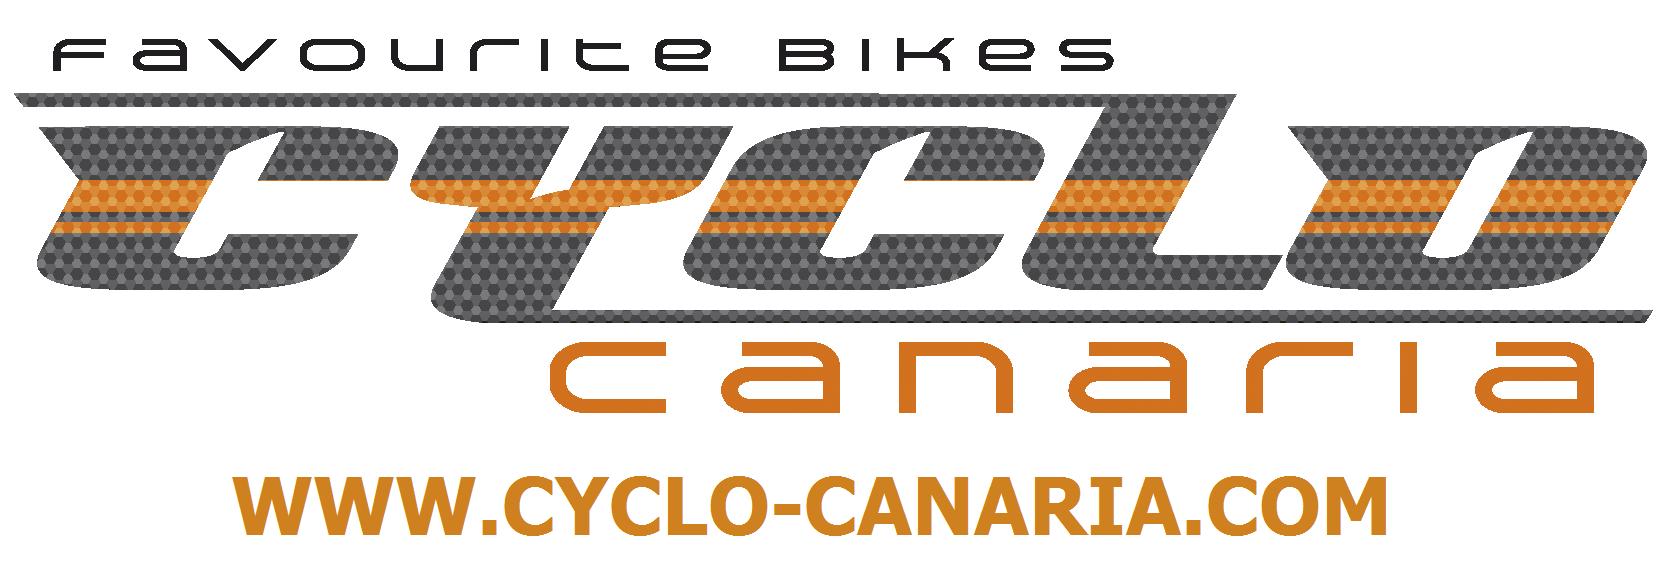 Logo mit Websitepng